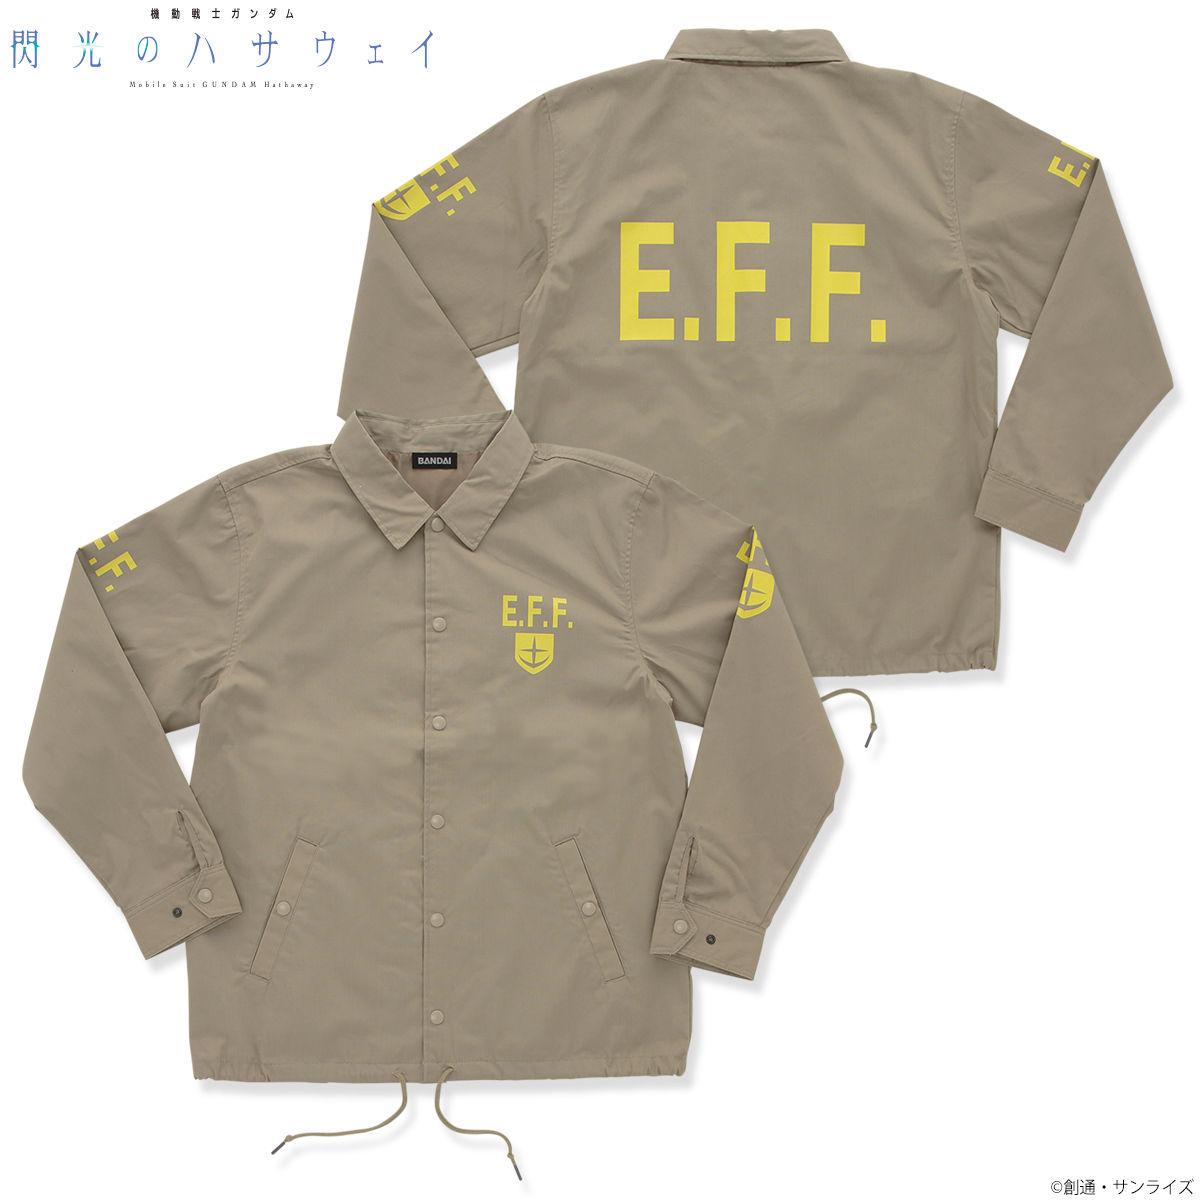 E.F.F. Jacket—Mobile Suit Gundam Hathaway